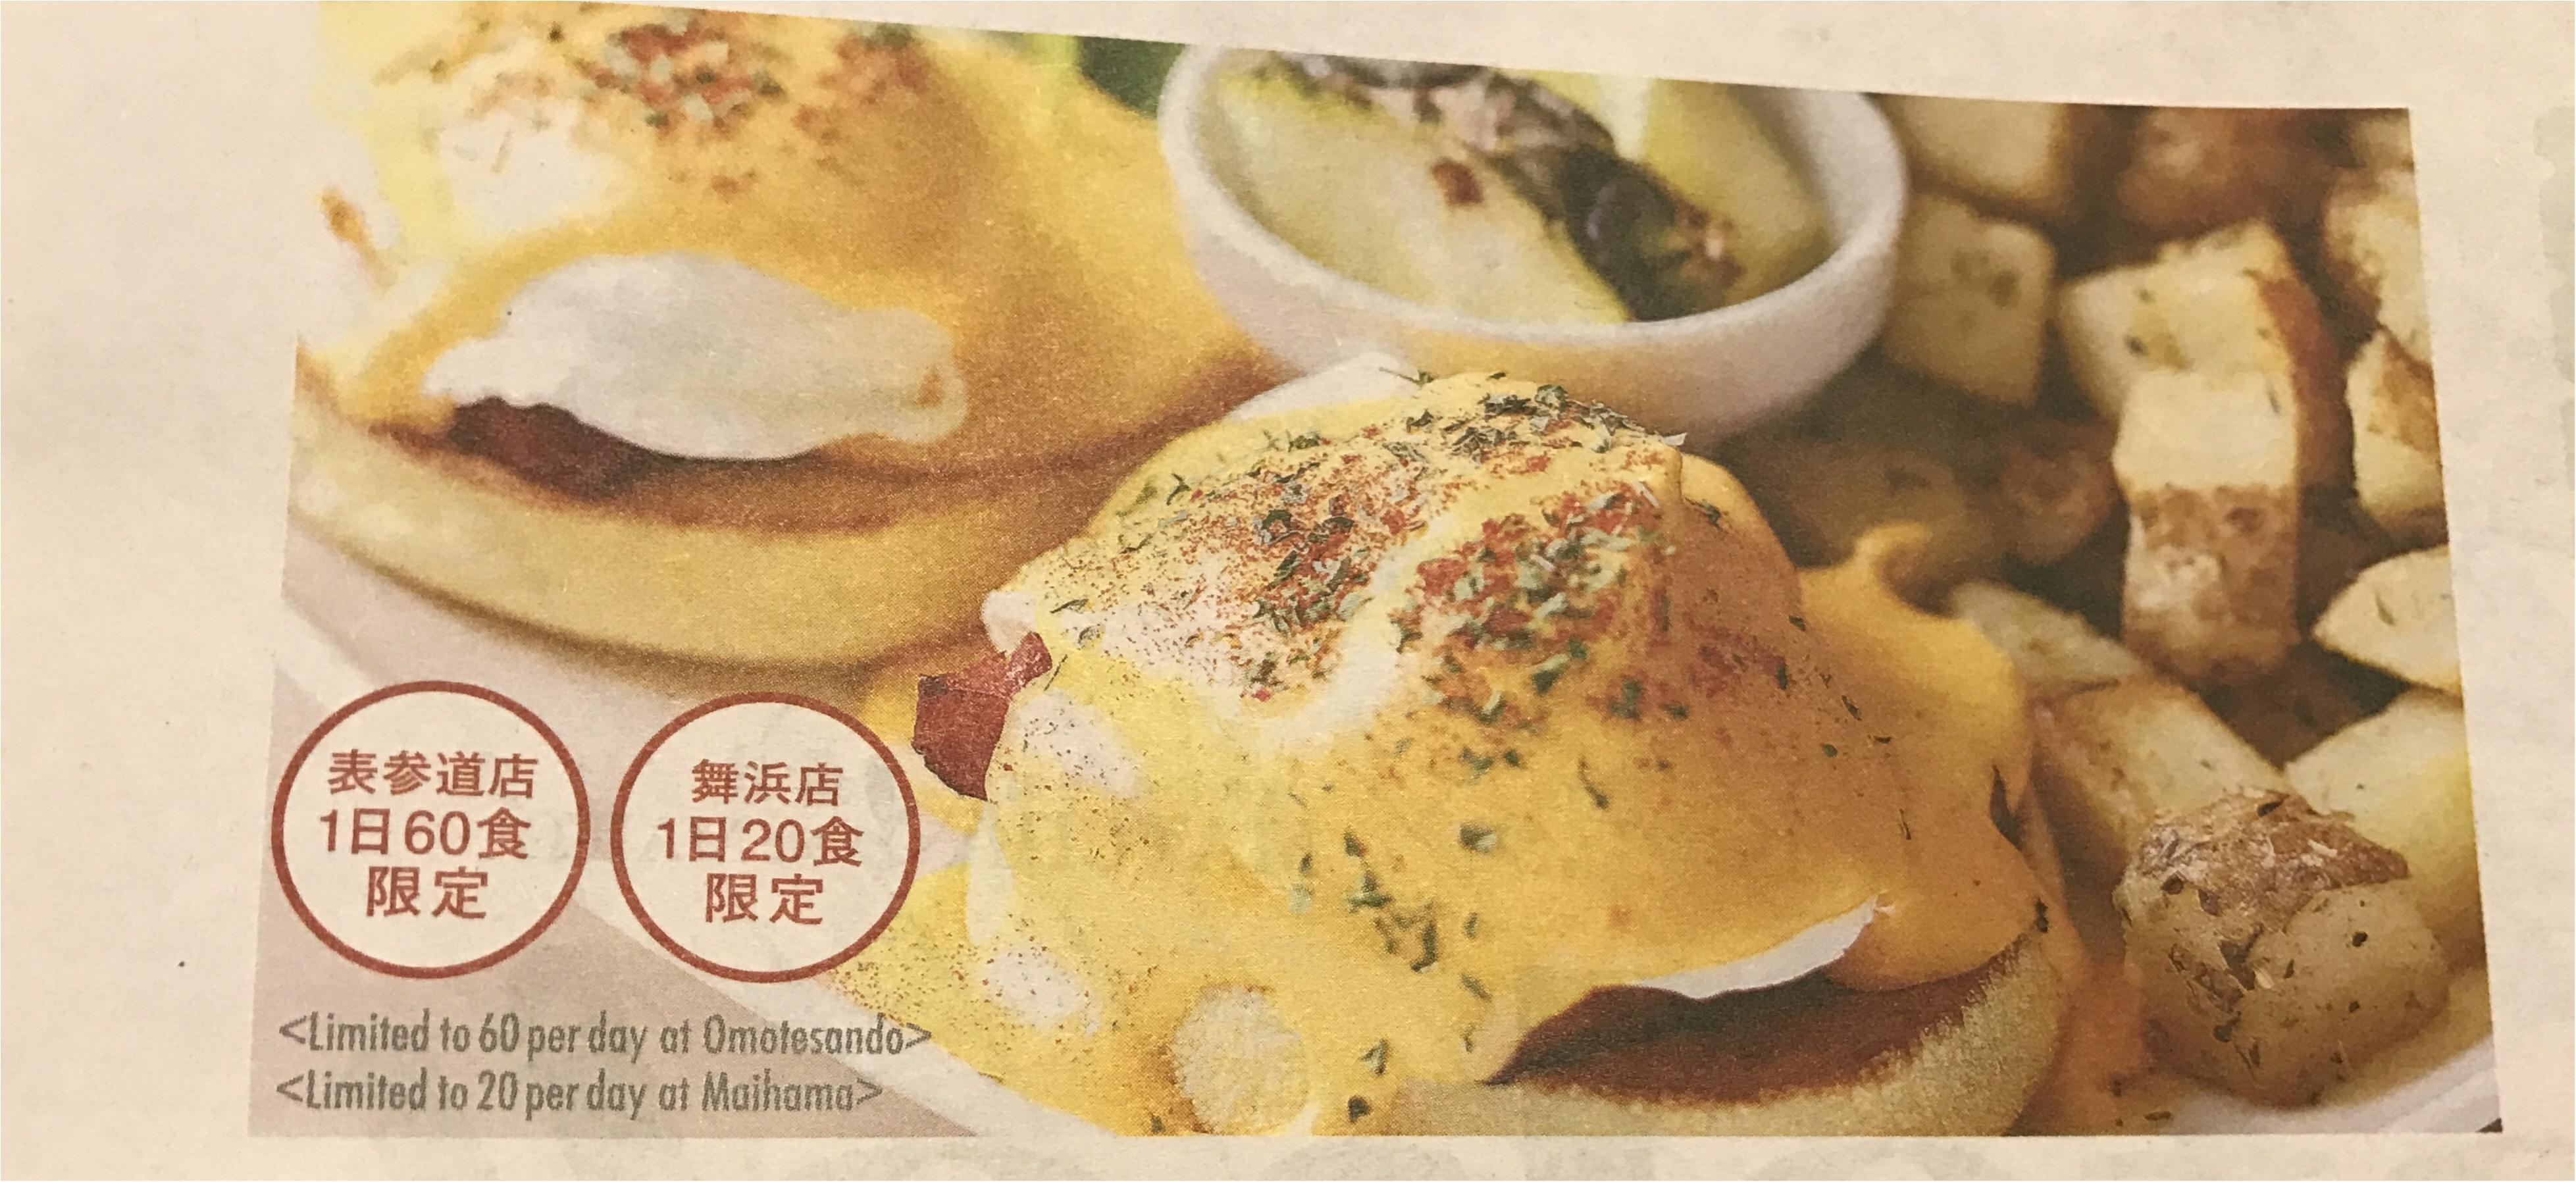 【Cafe Kaila】ハワイ本店でもあっという間に完売してしまう1日60食限定のスペシャルメニューとは♡_2